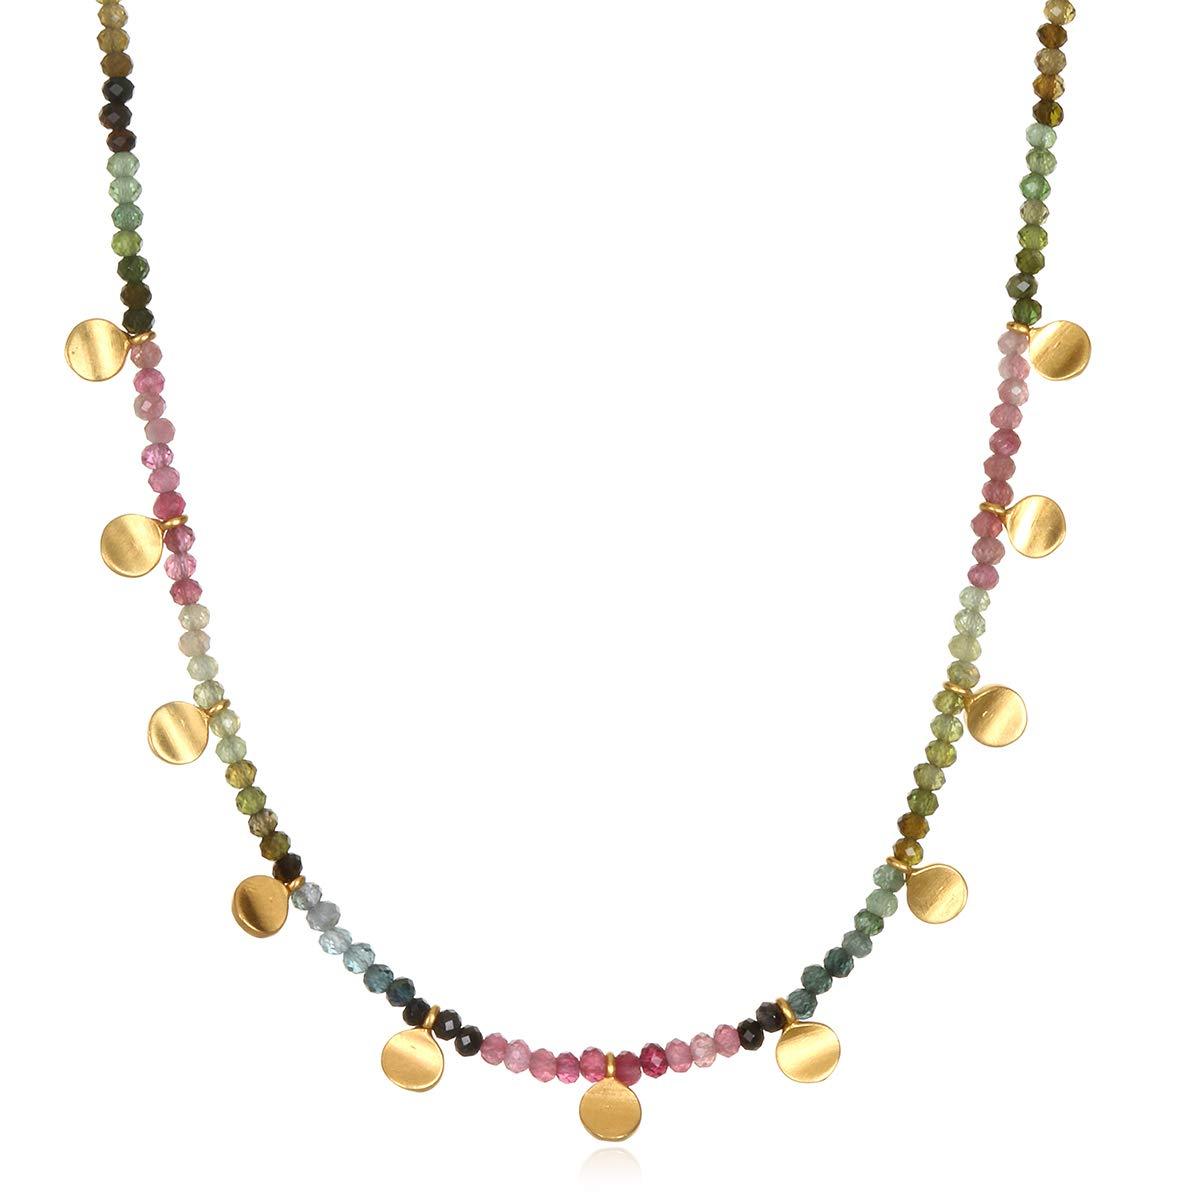 Satya Jewelry Women's Tourmaline Gold Moon Choker Necklace 14-Inch +2'' Extension, Multi, One Size